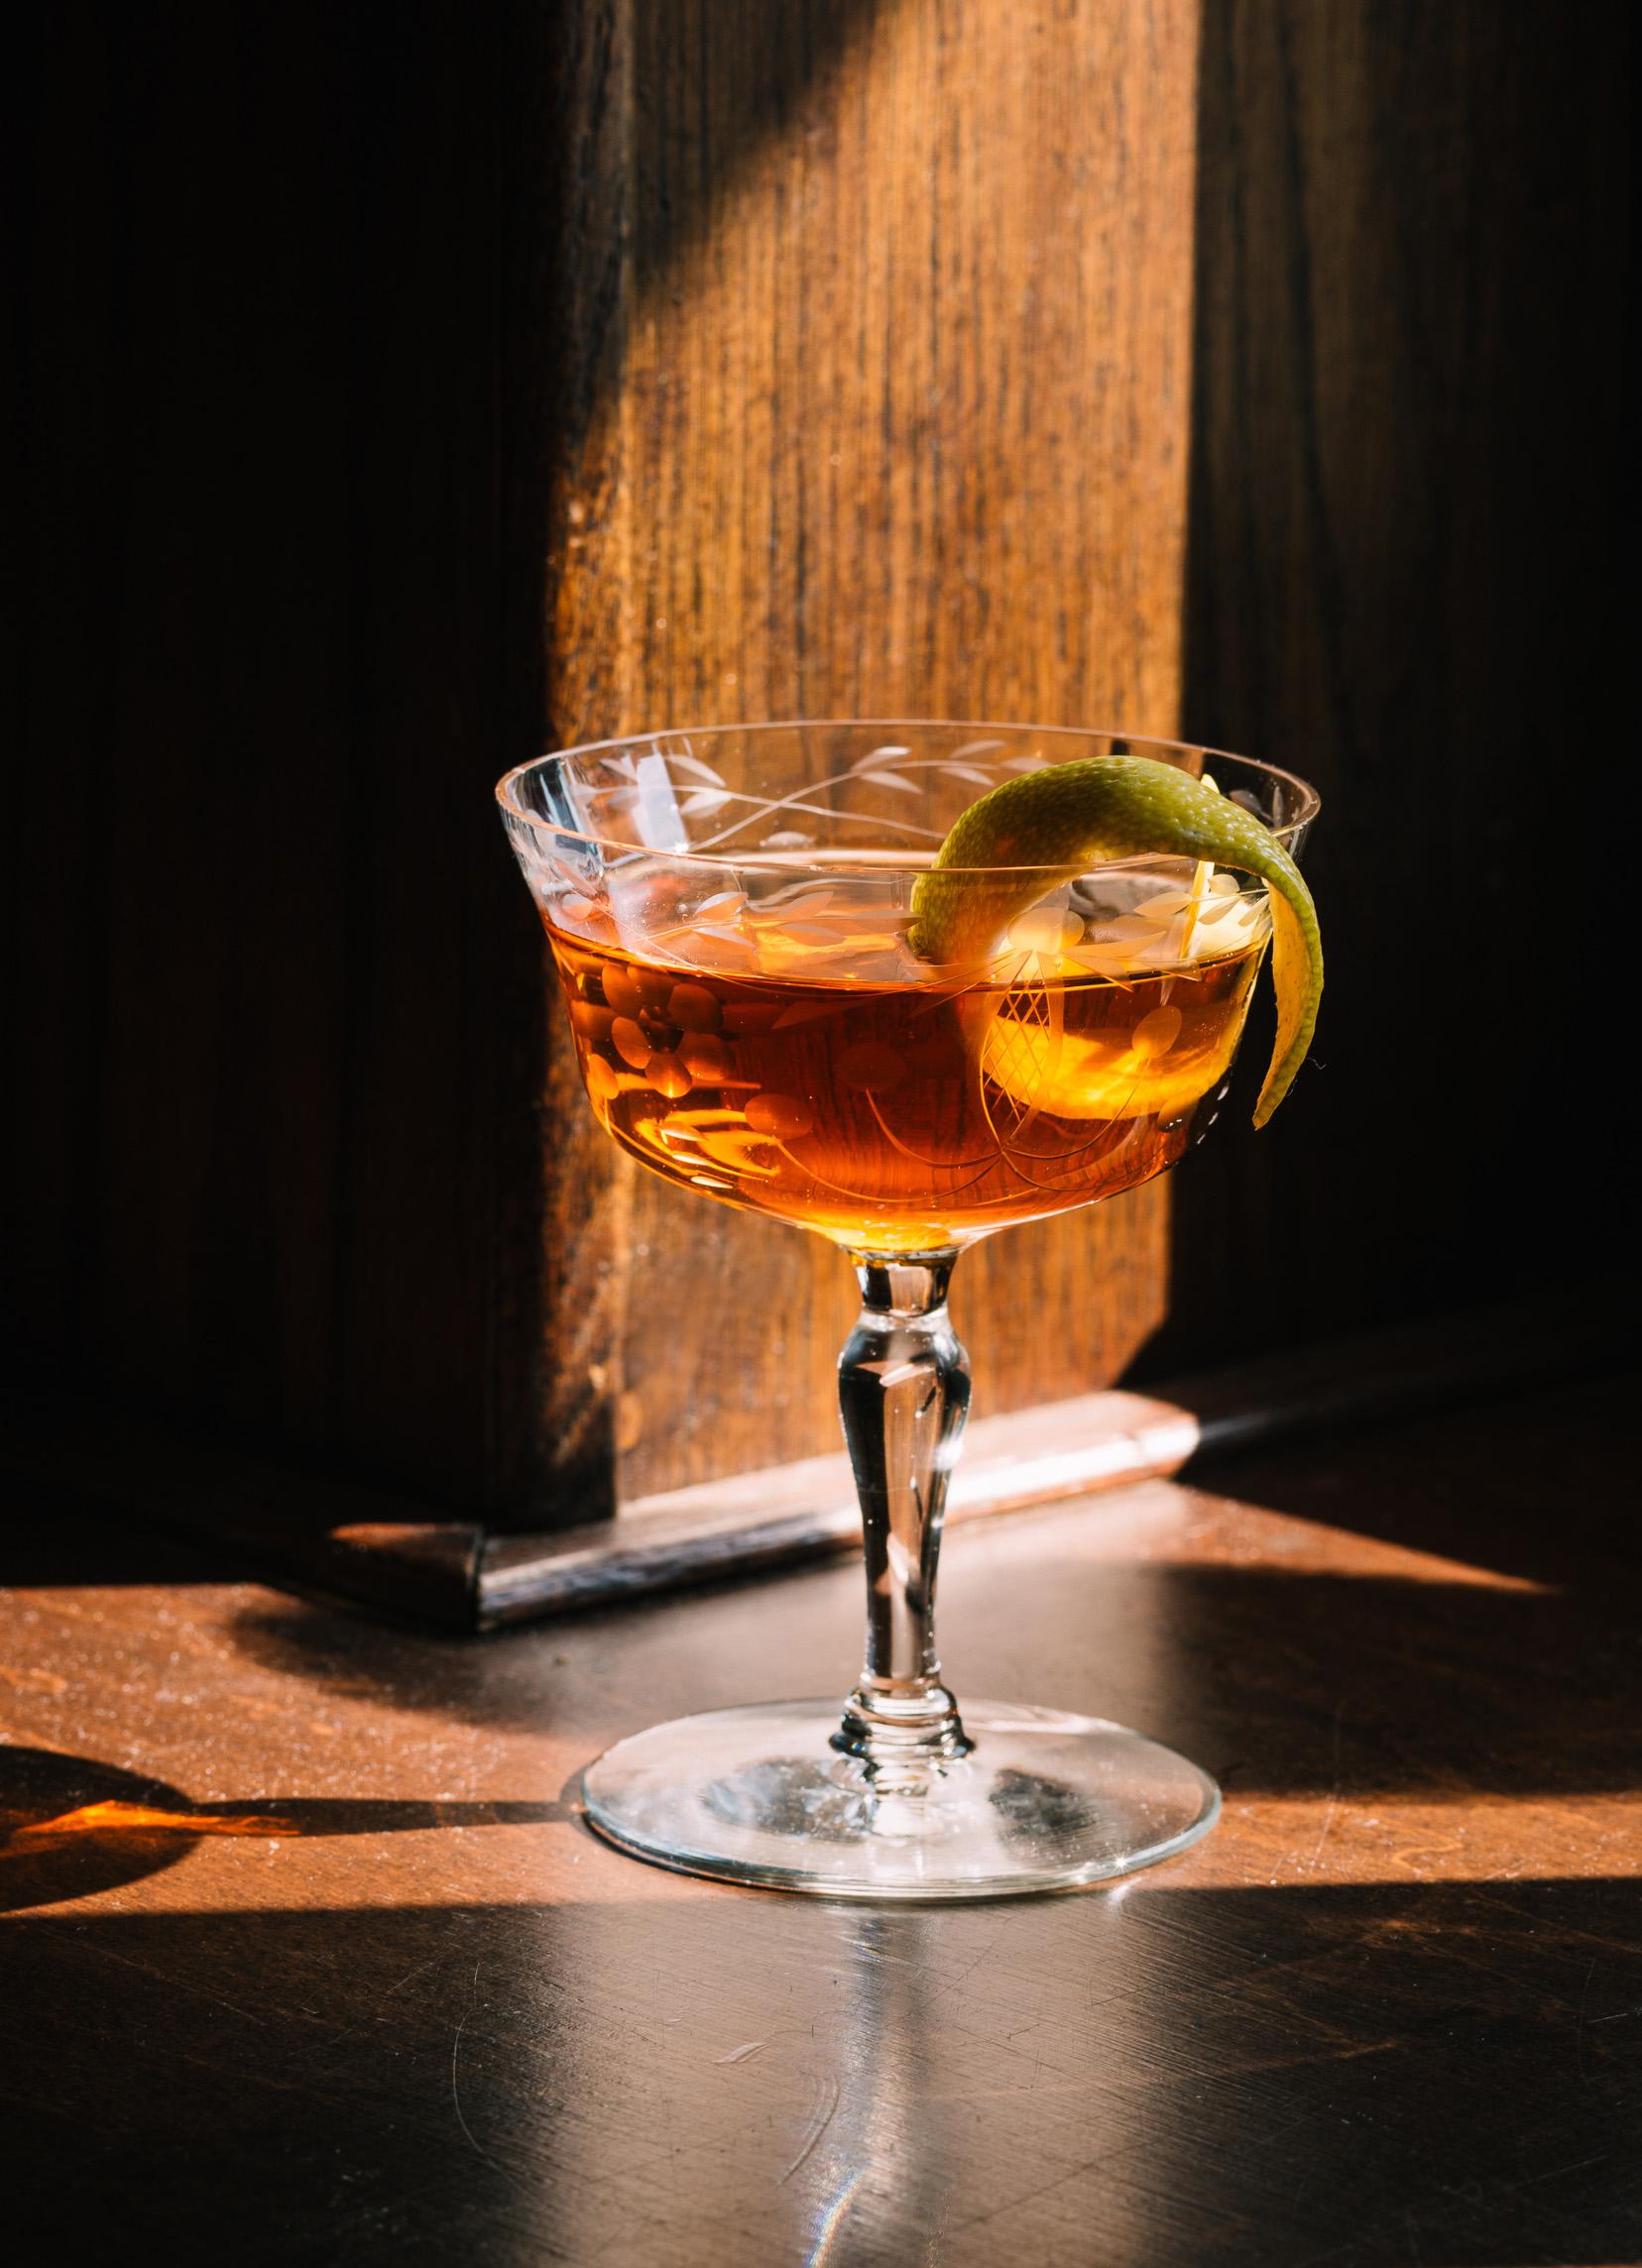 The Moga at Bar Moga